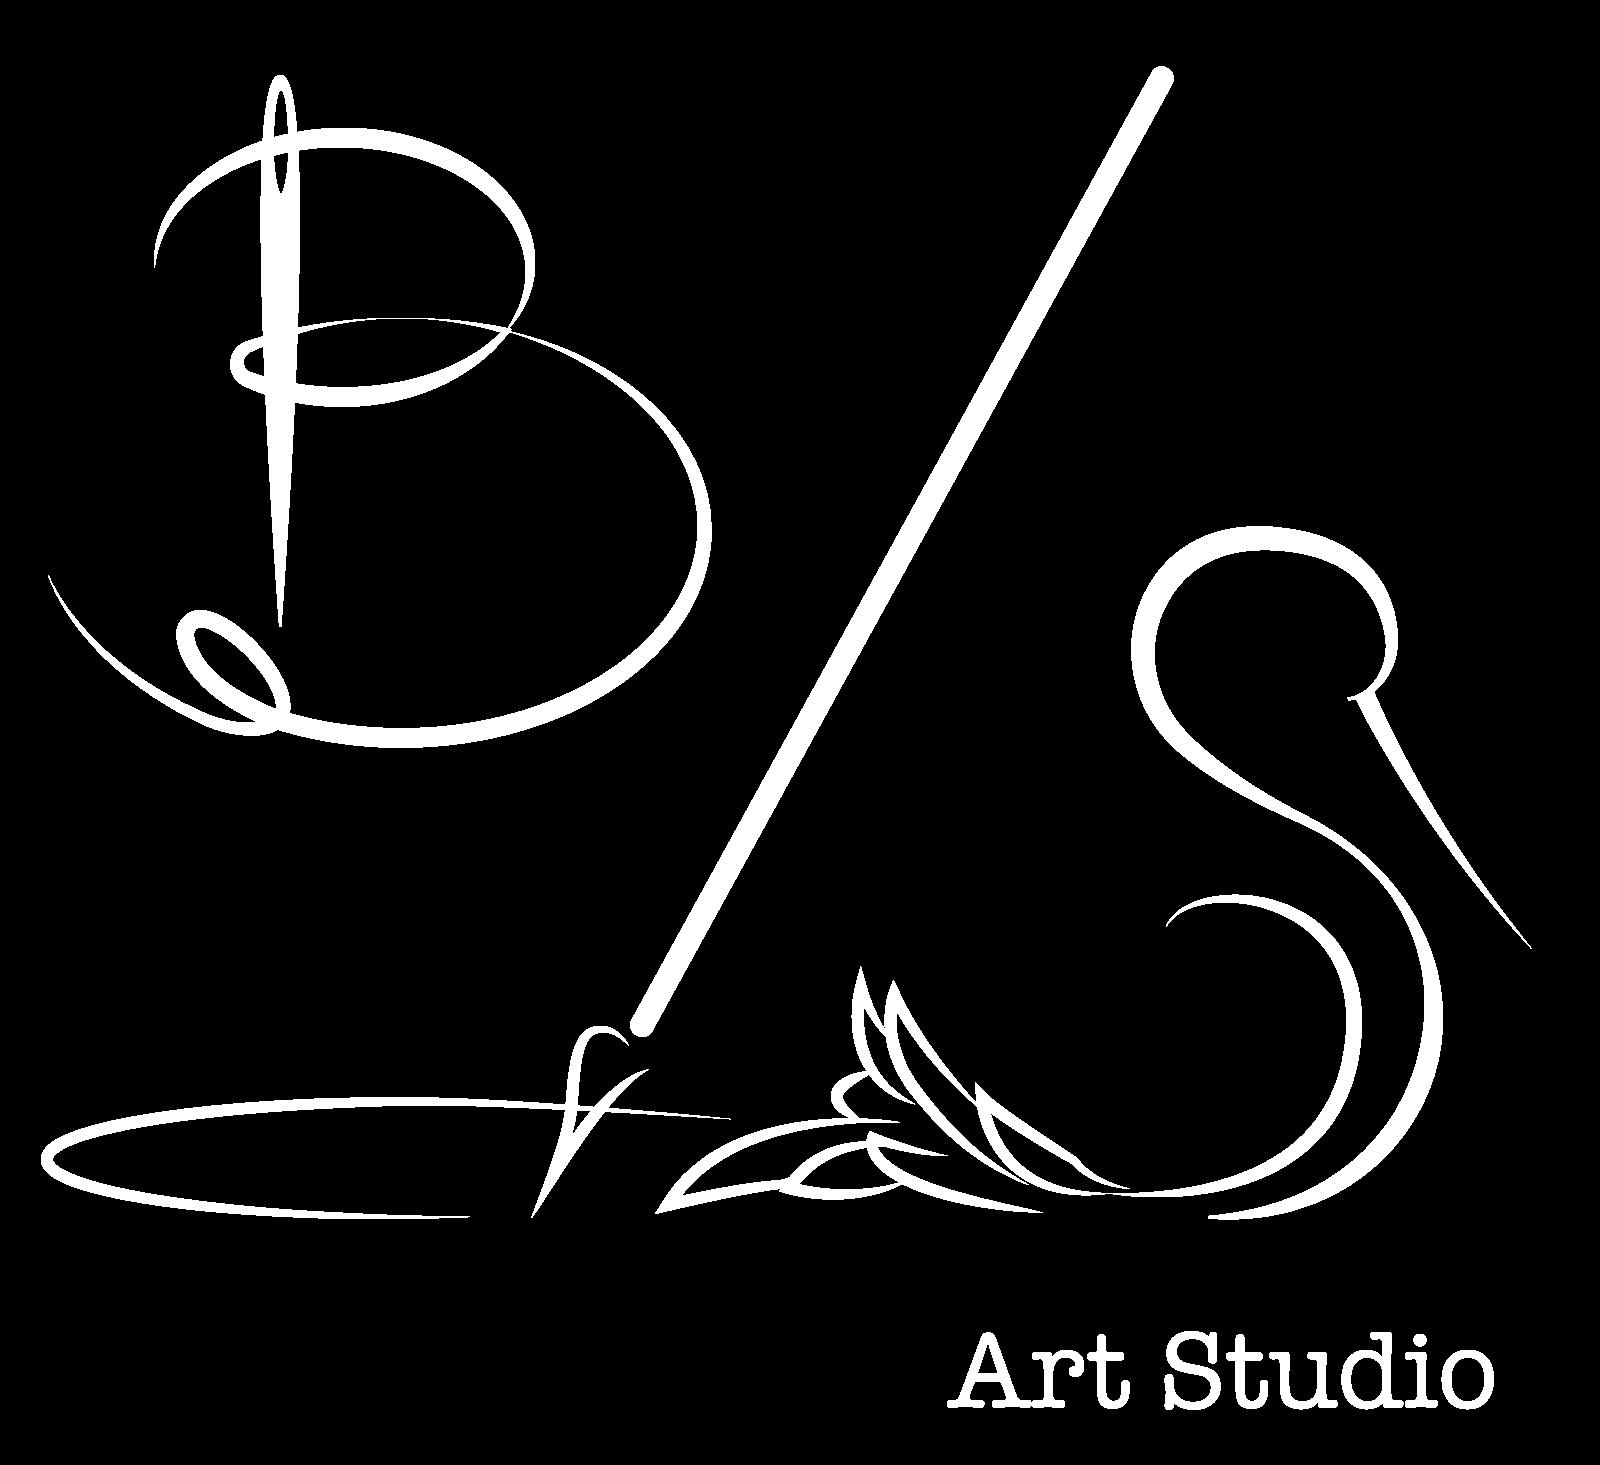 B/S Art Studio